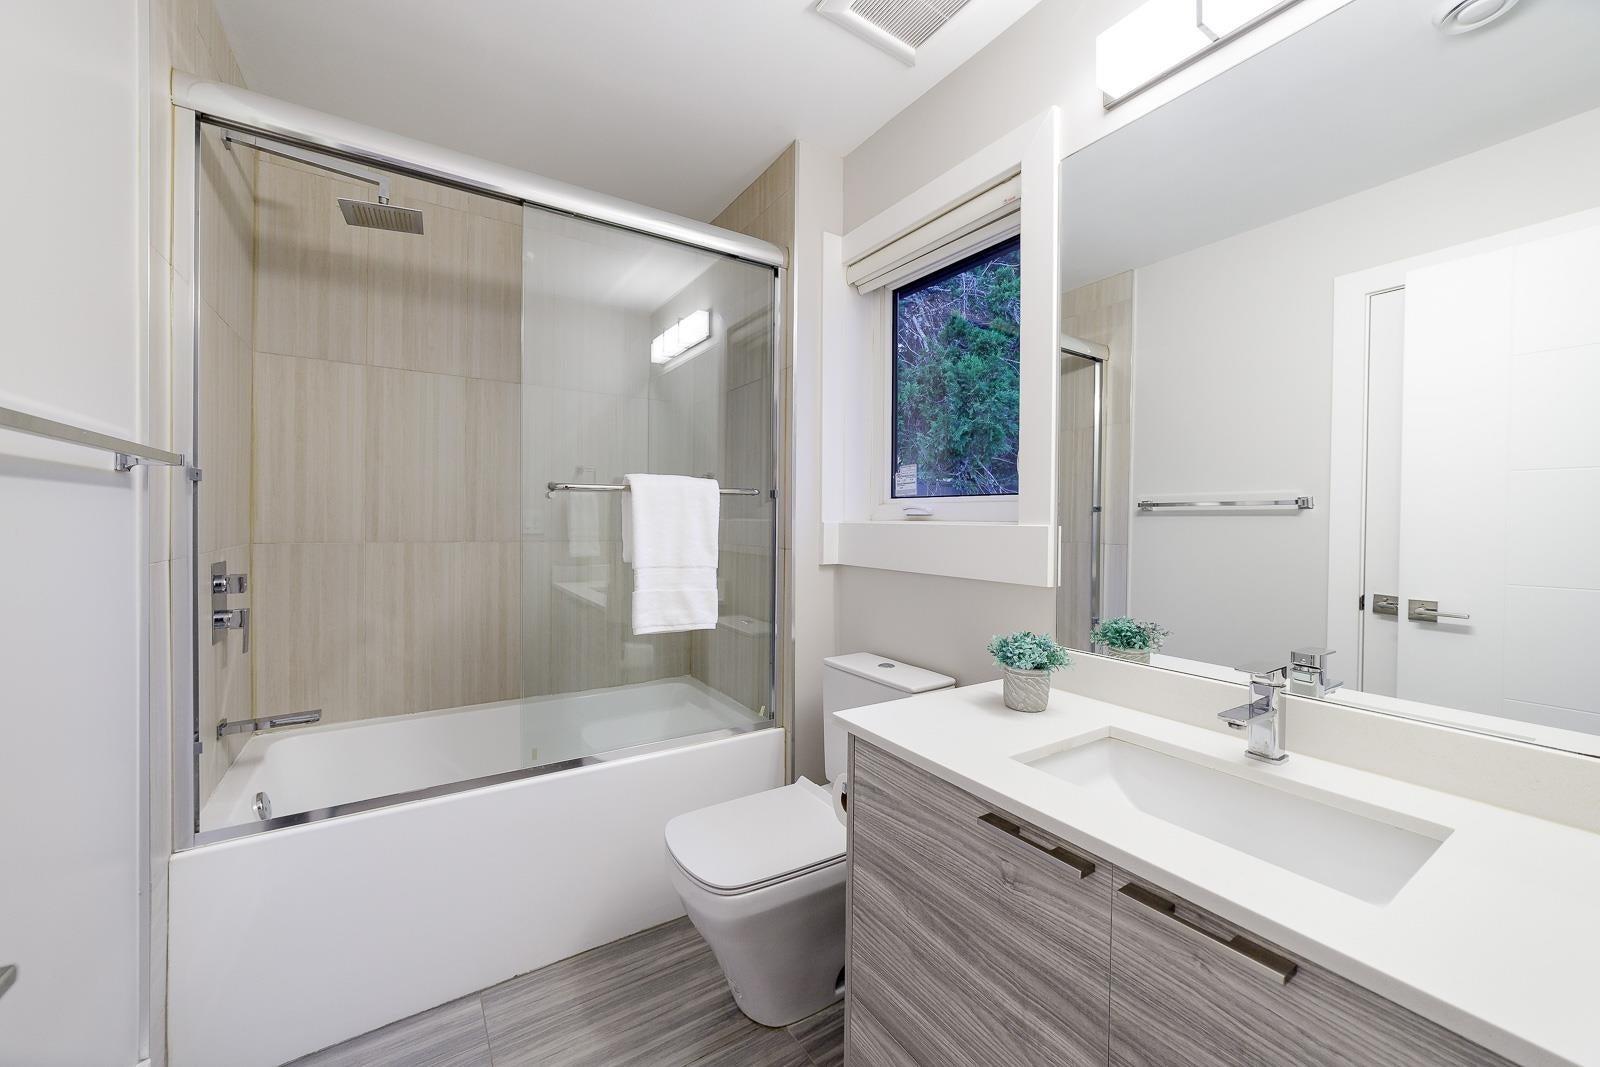 517 GRANADA CRESCENT - Upper Delbrook House/Single Family for sale, 8 Bedrooms (R2615057) - #22